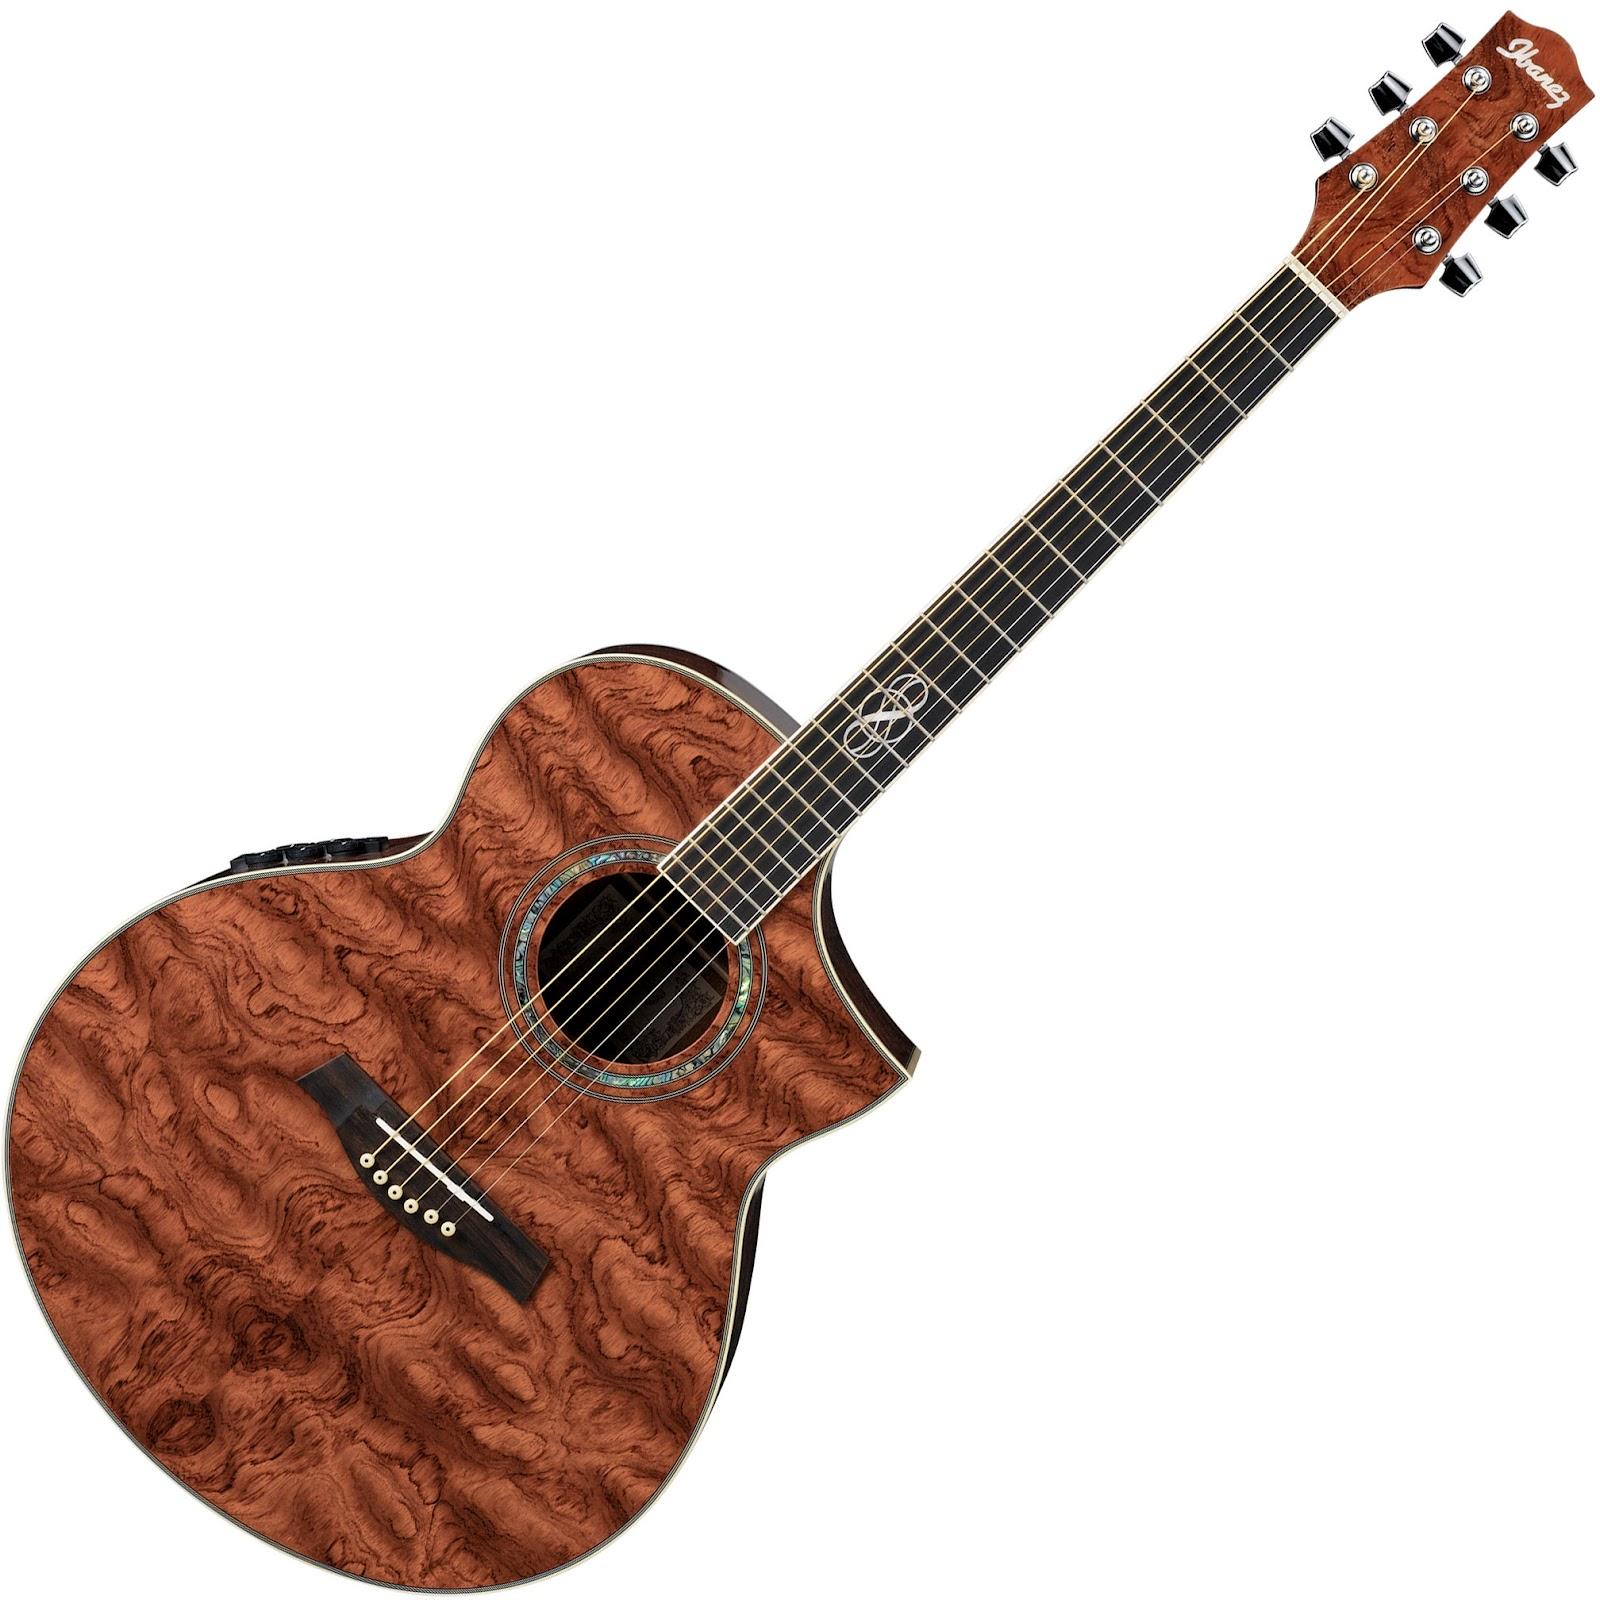 Afinador electronico de guitarra acoustica online dating 5